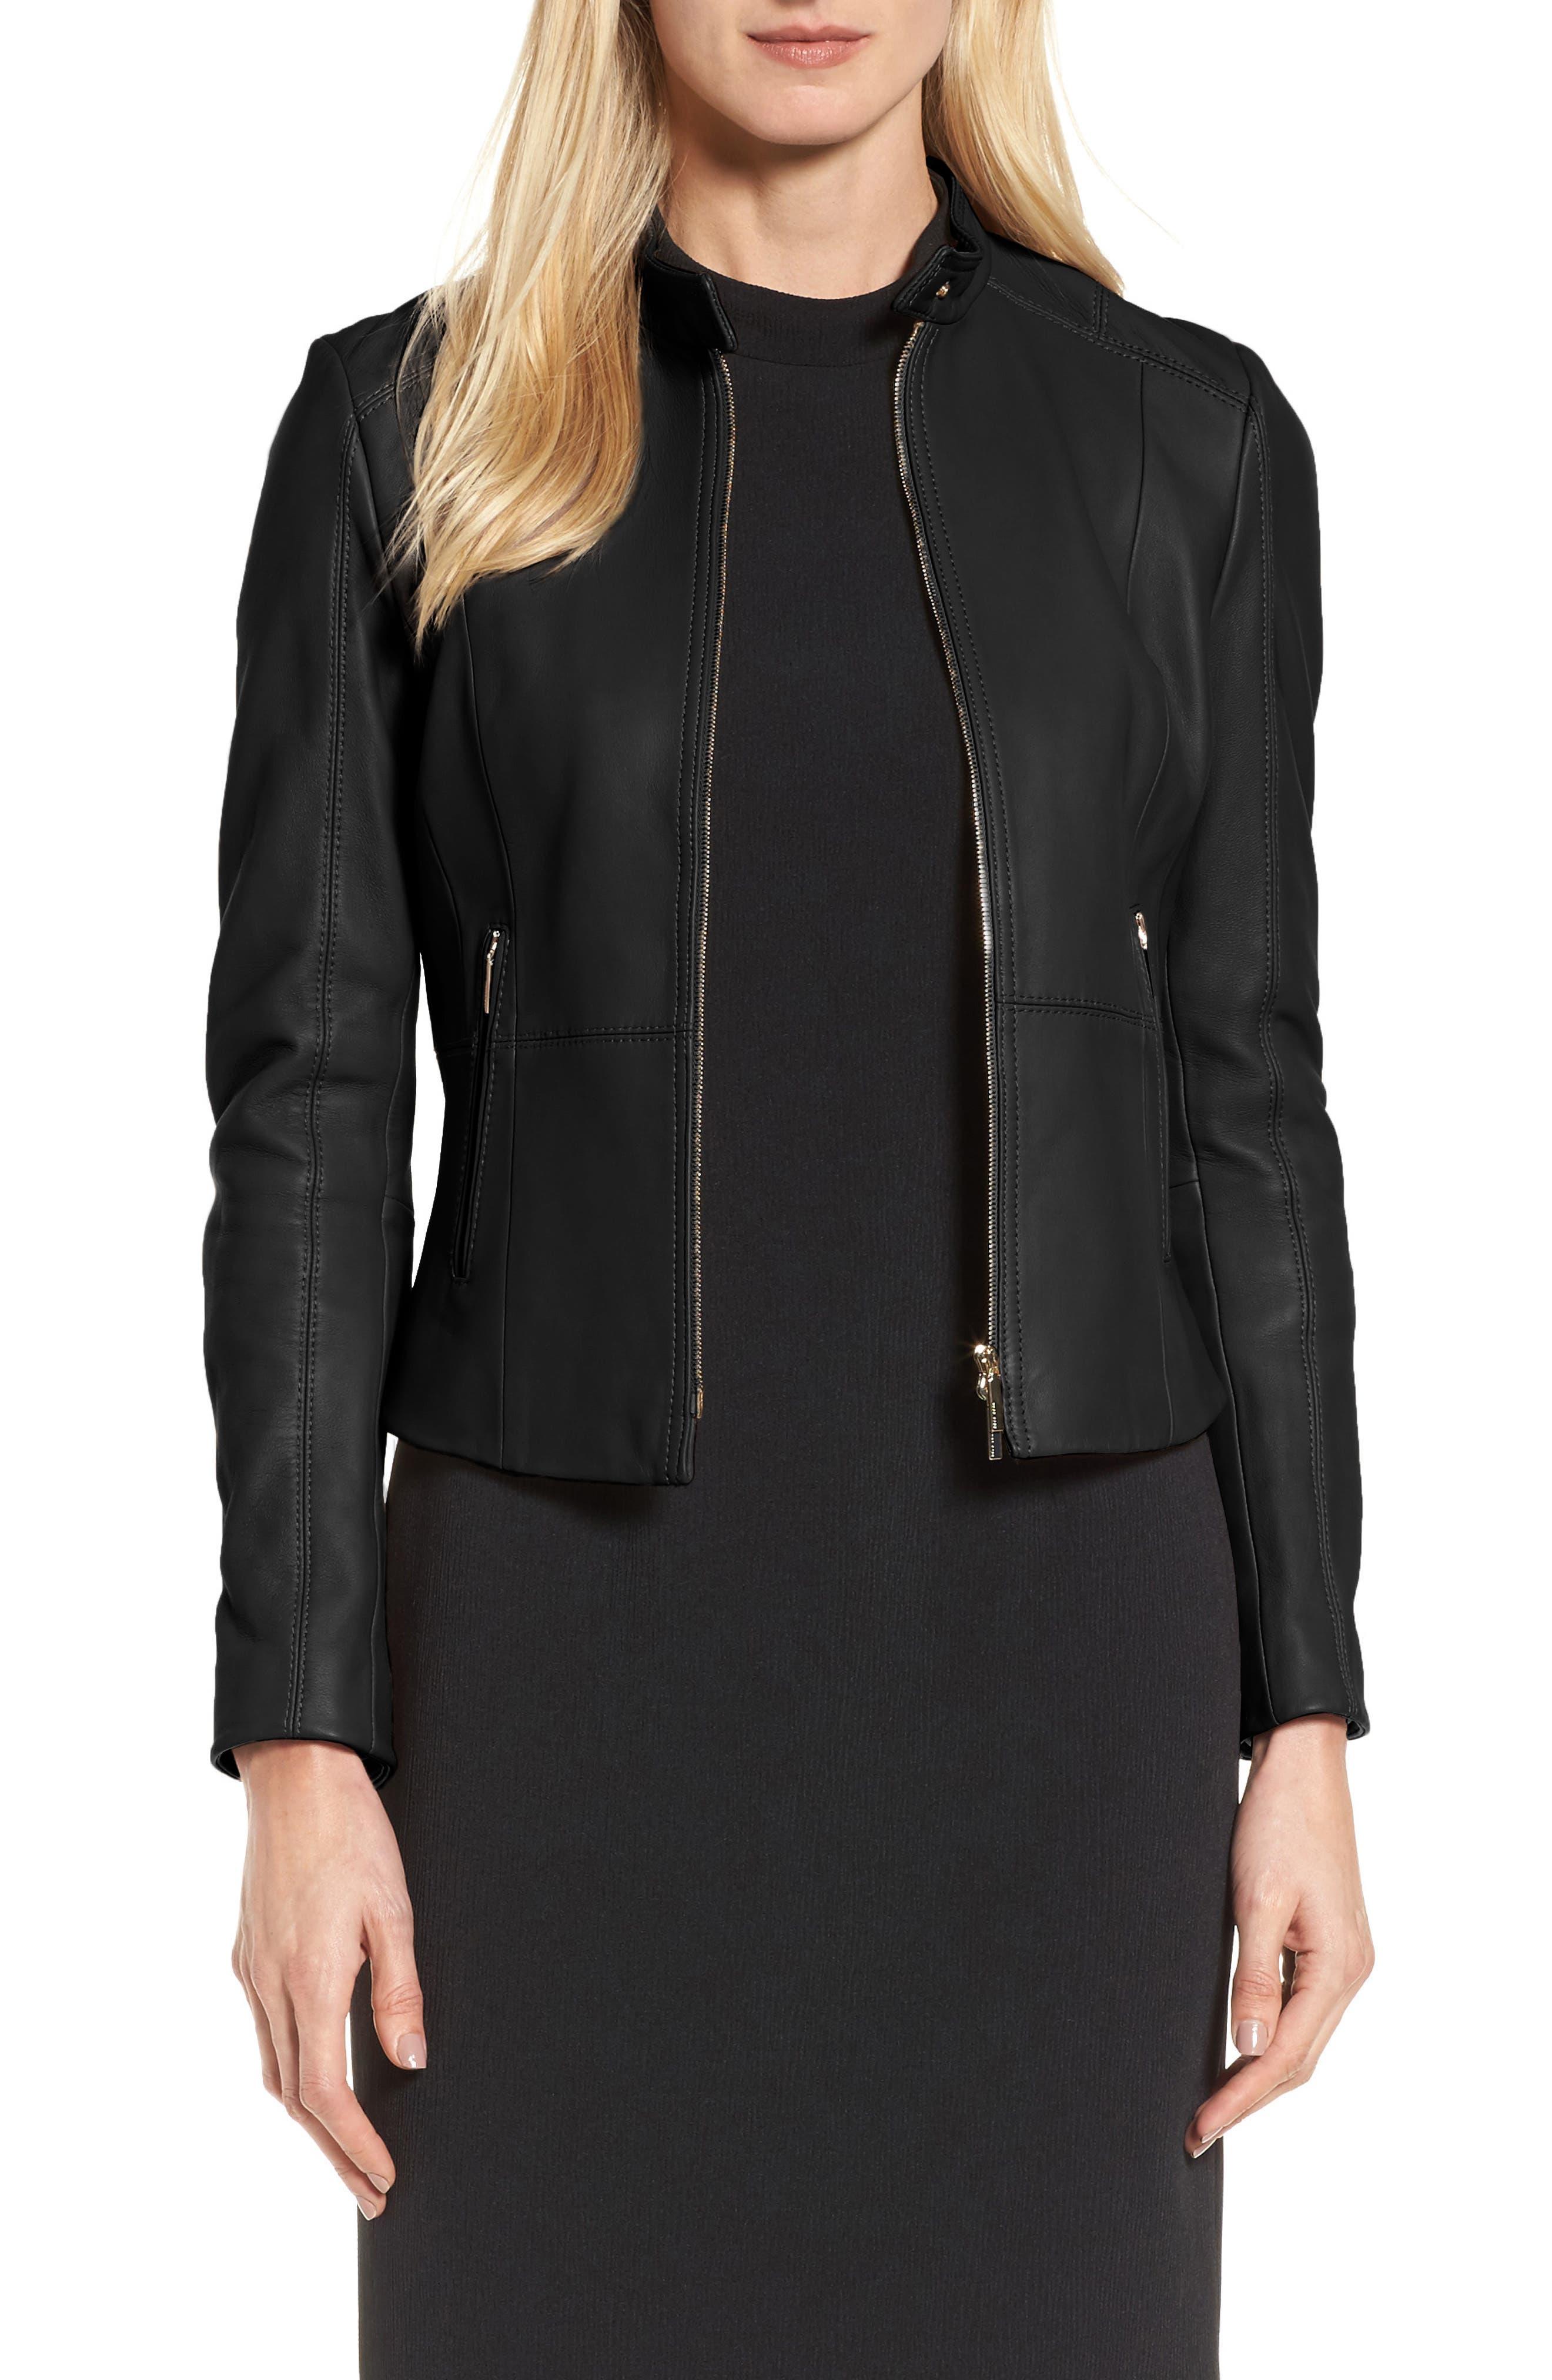 Sammonaie Leather Jacket,                             Main thumbnail 1, color,                             001